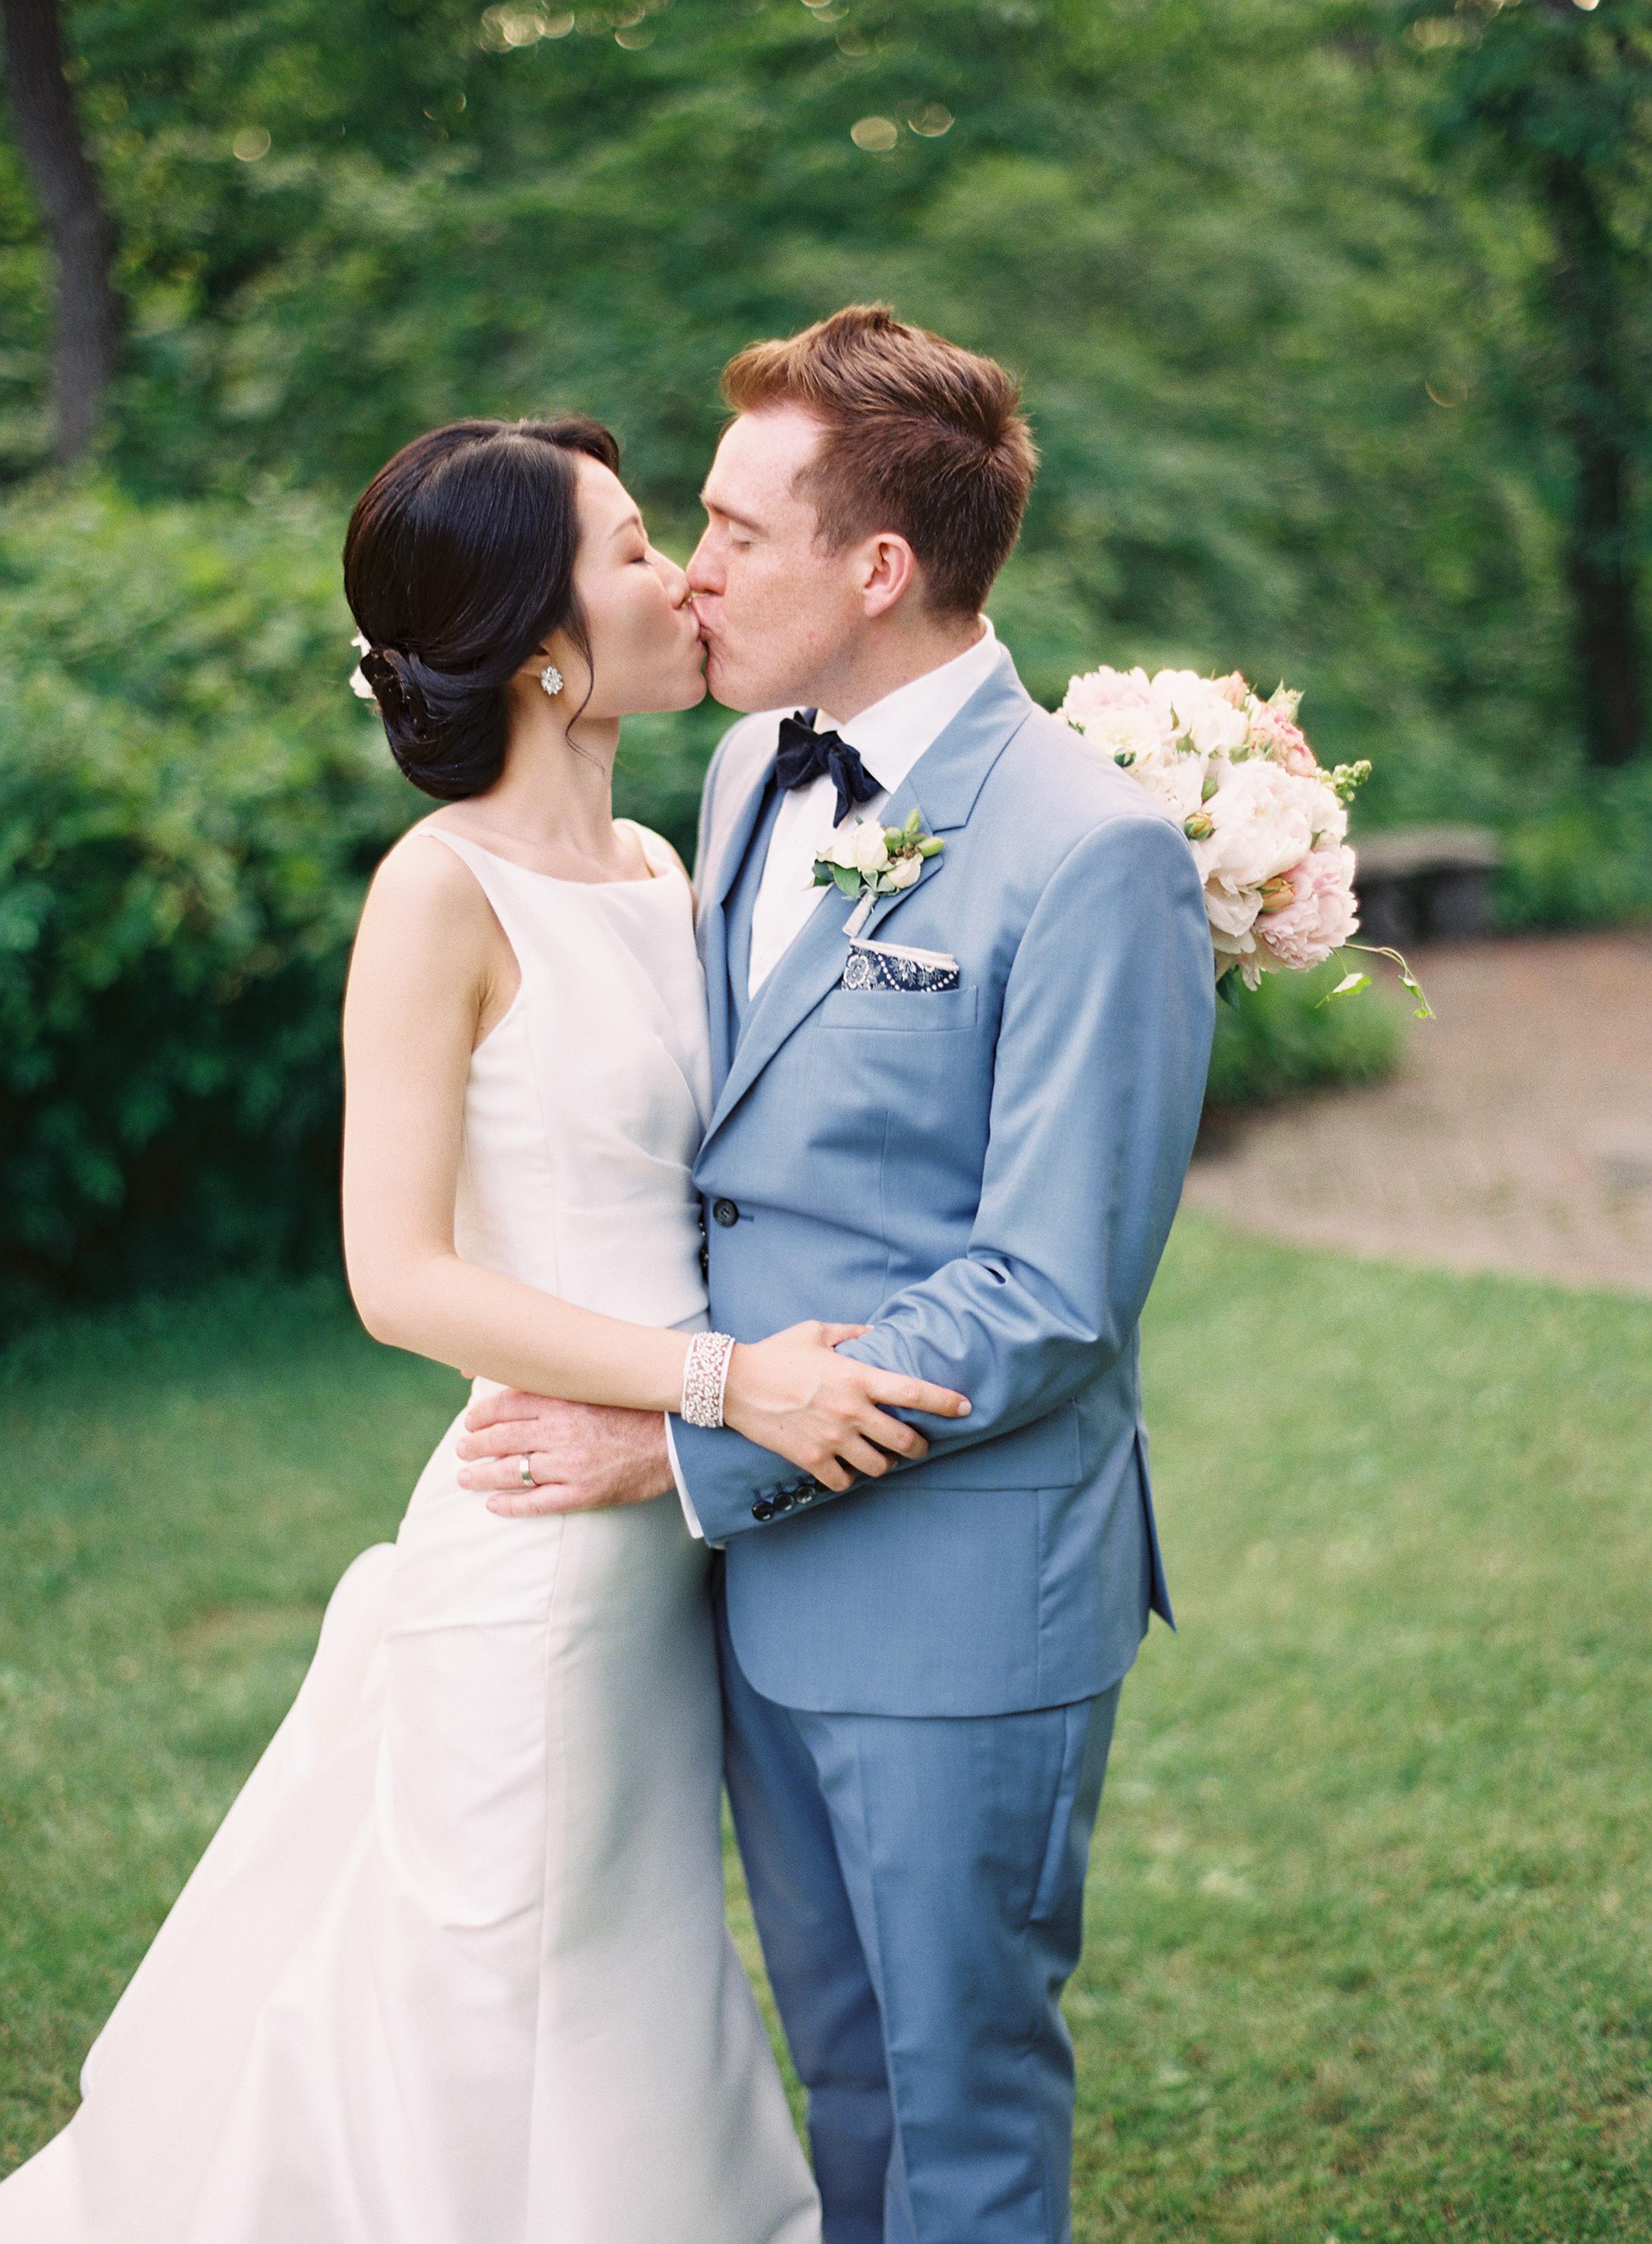 Blue Suit Grooms Attire - Elizabeth Anne Designs: The Wedding Blog